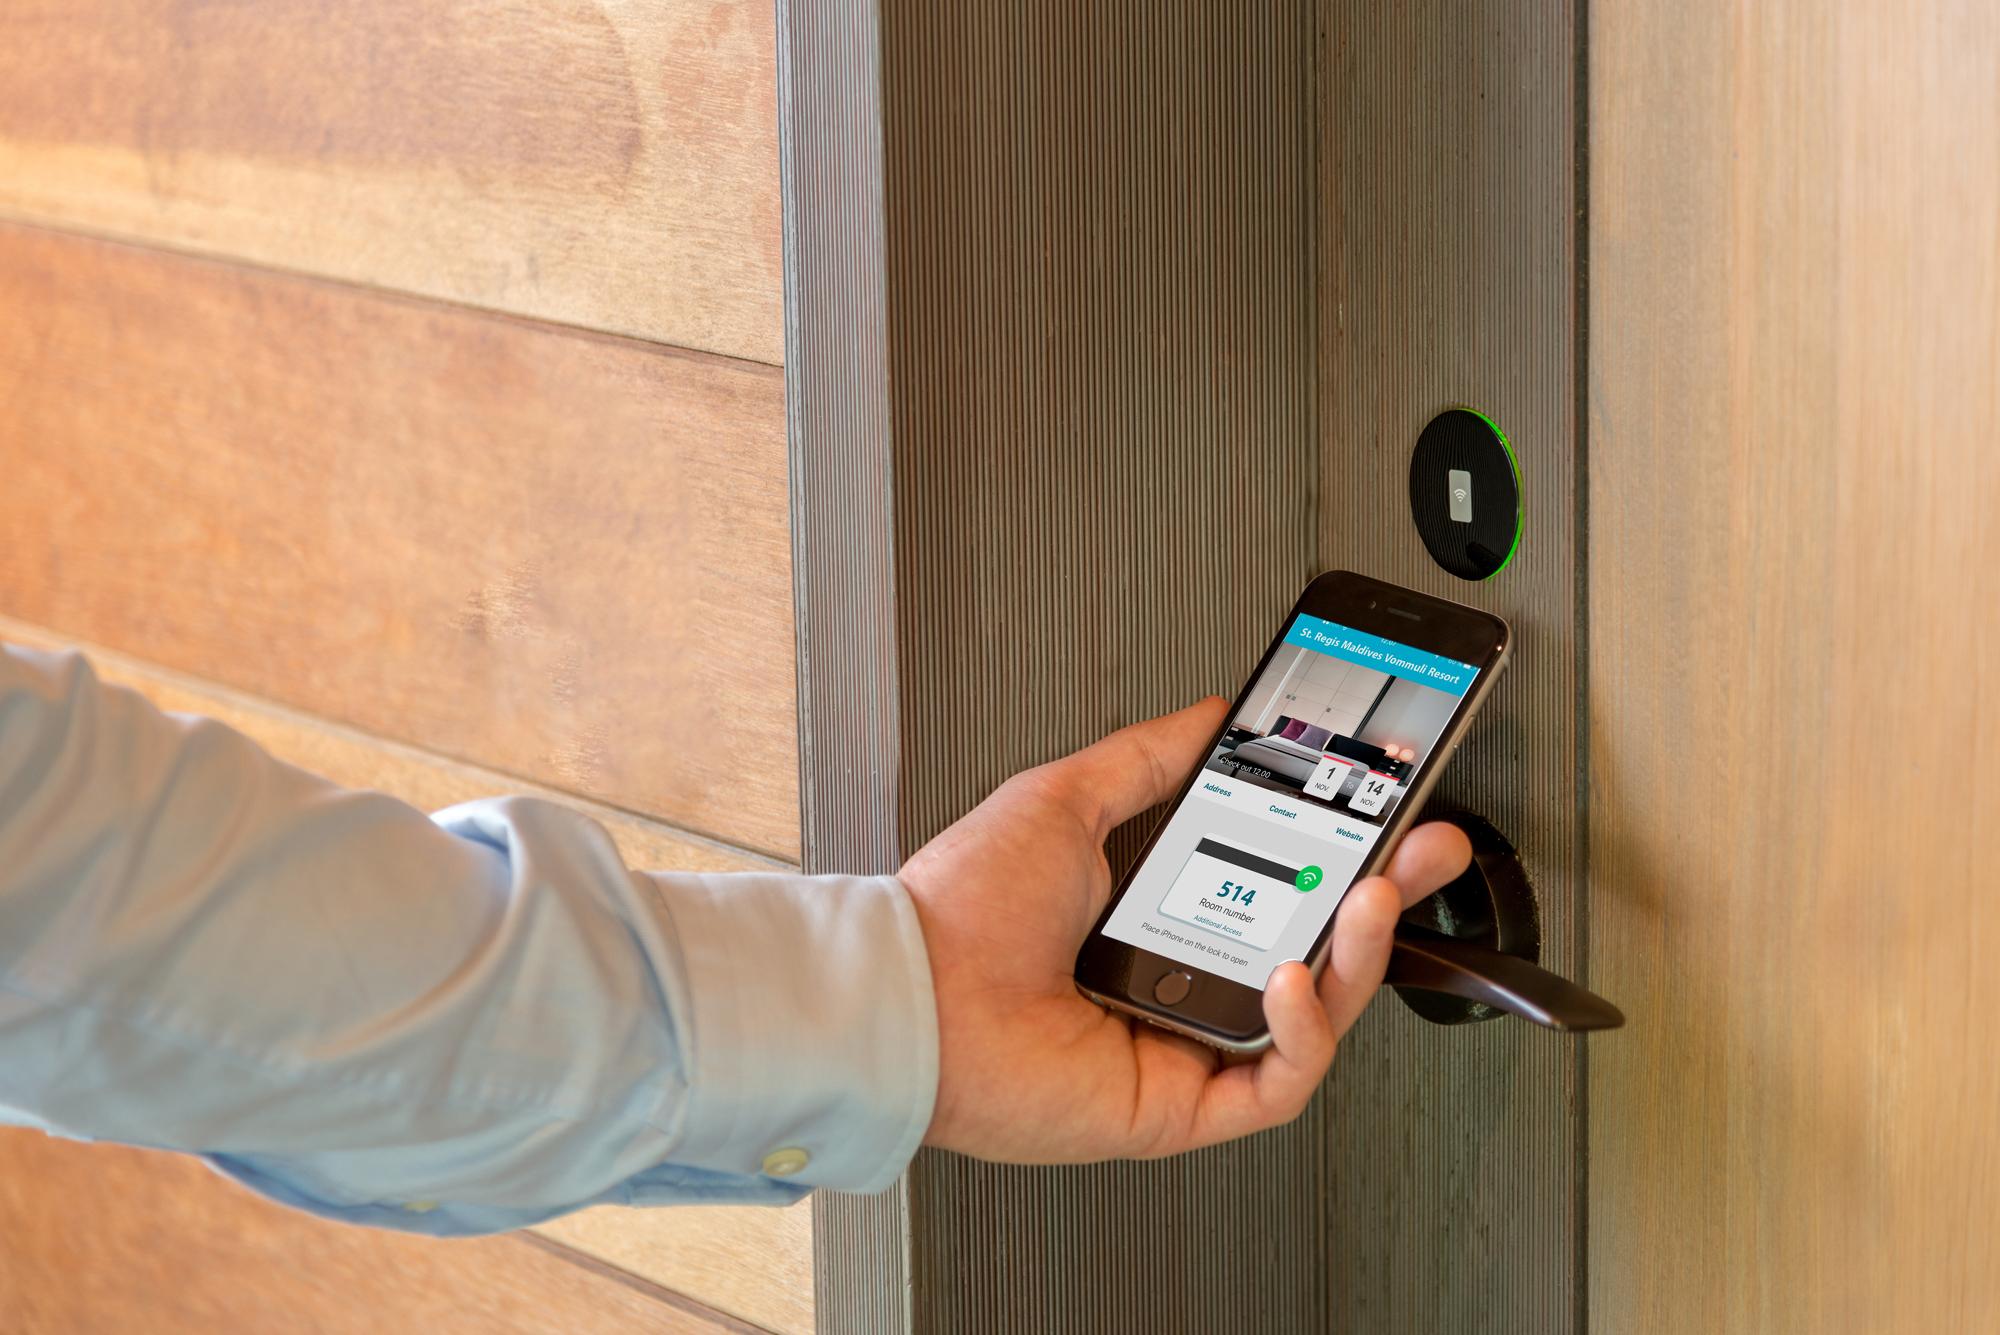 What S Next In Hotel Door Lock Technology Hotel Management